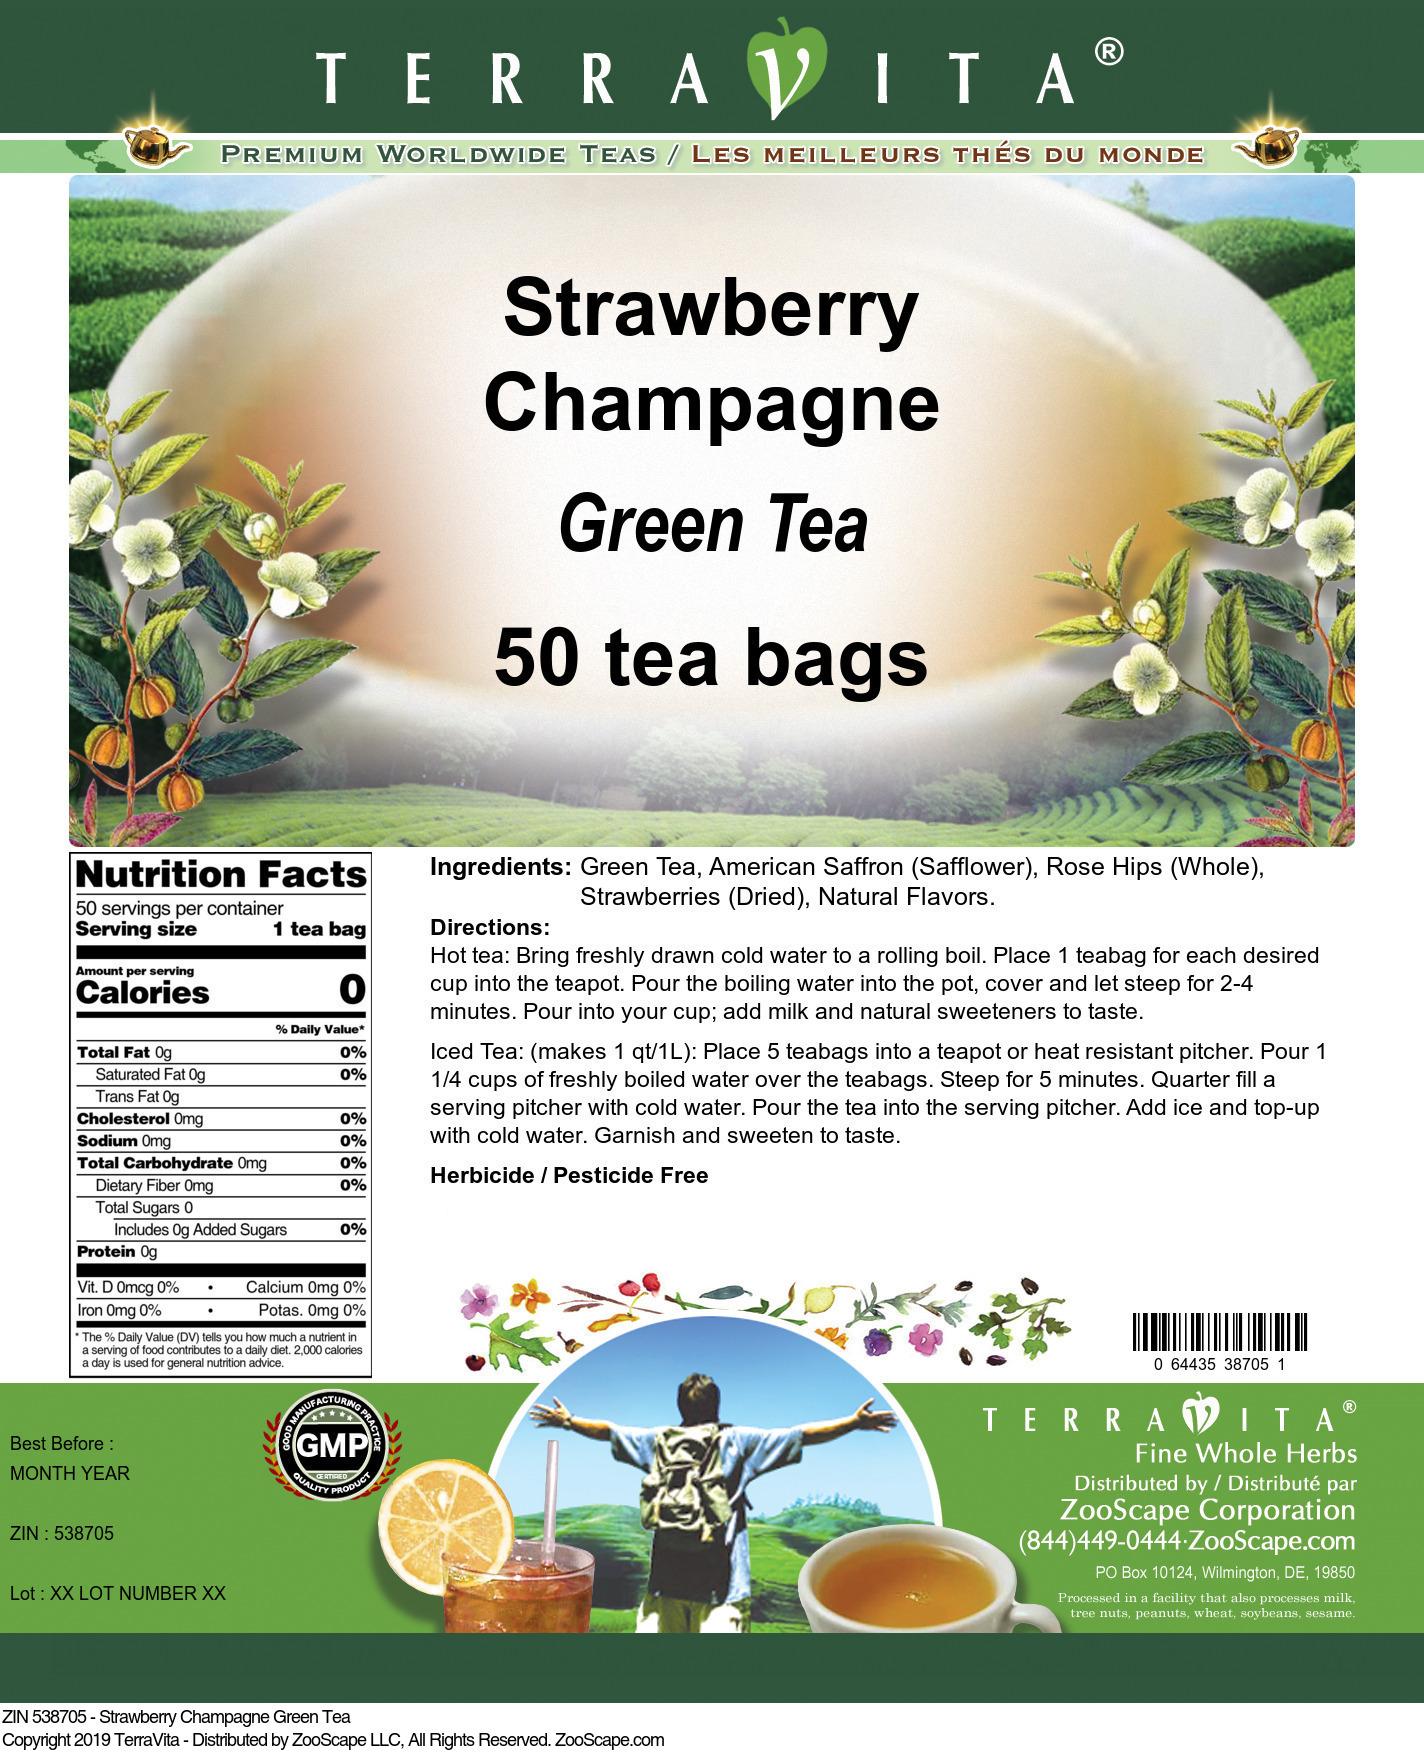 Strawberry Champagne Green Tea